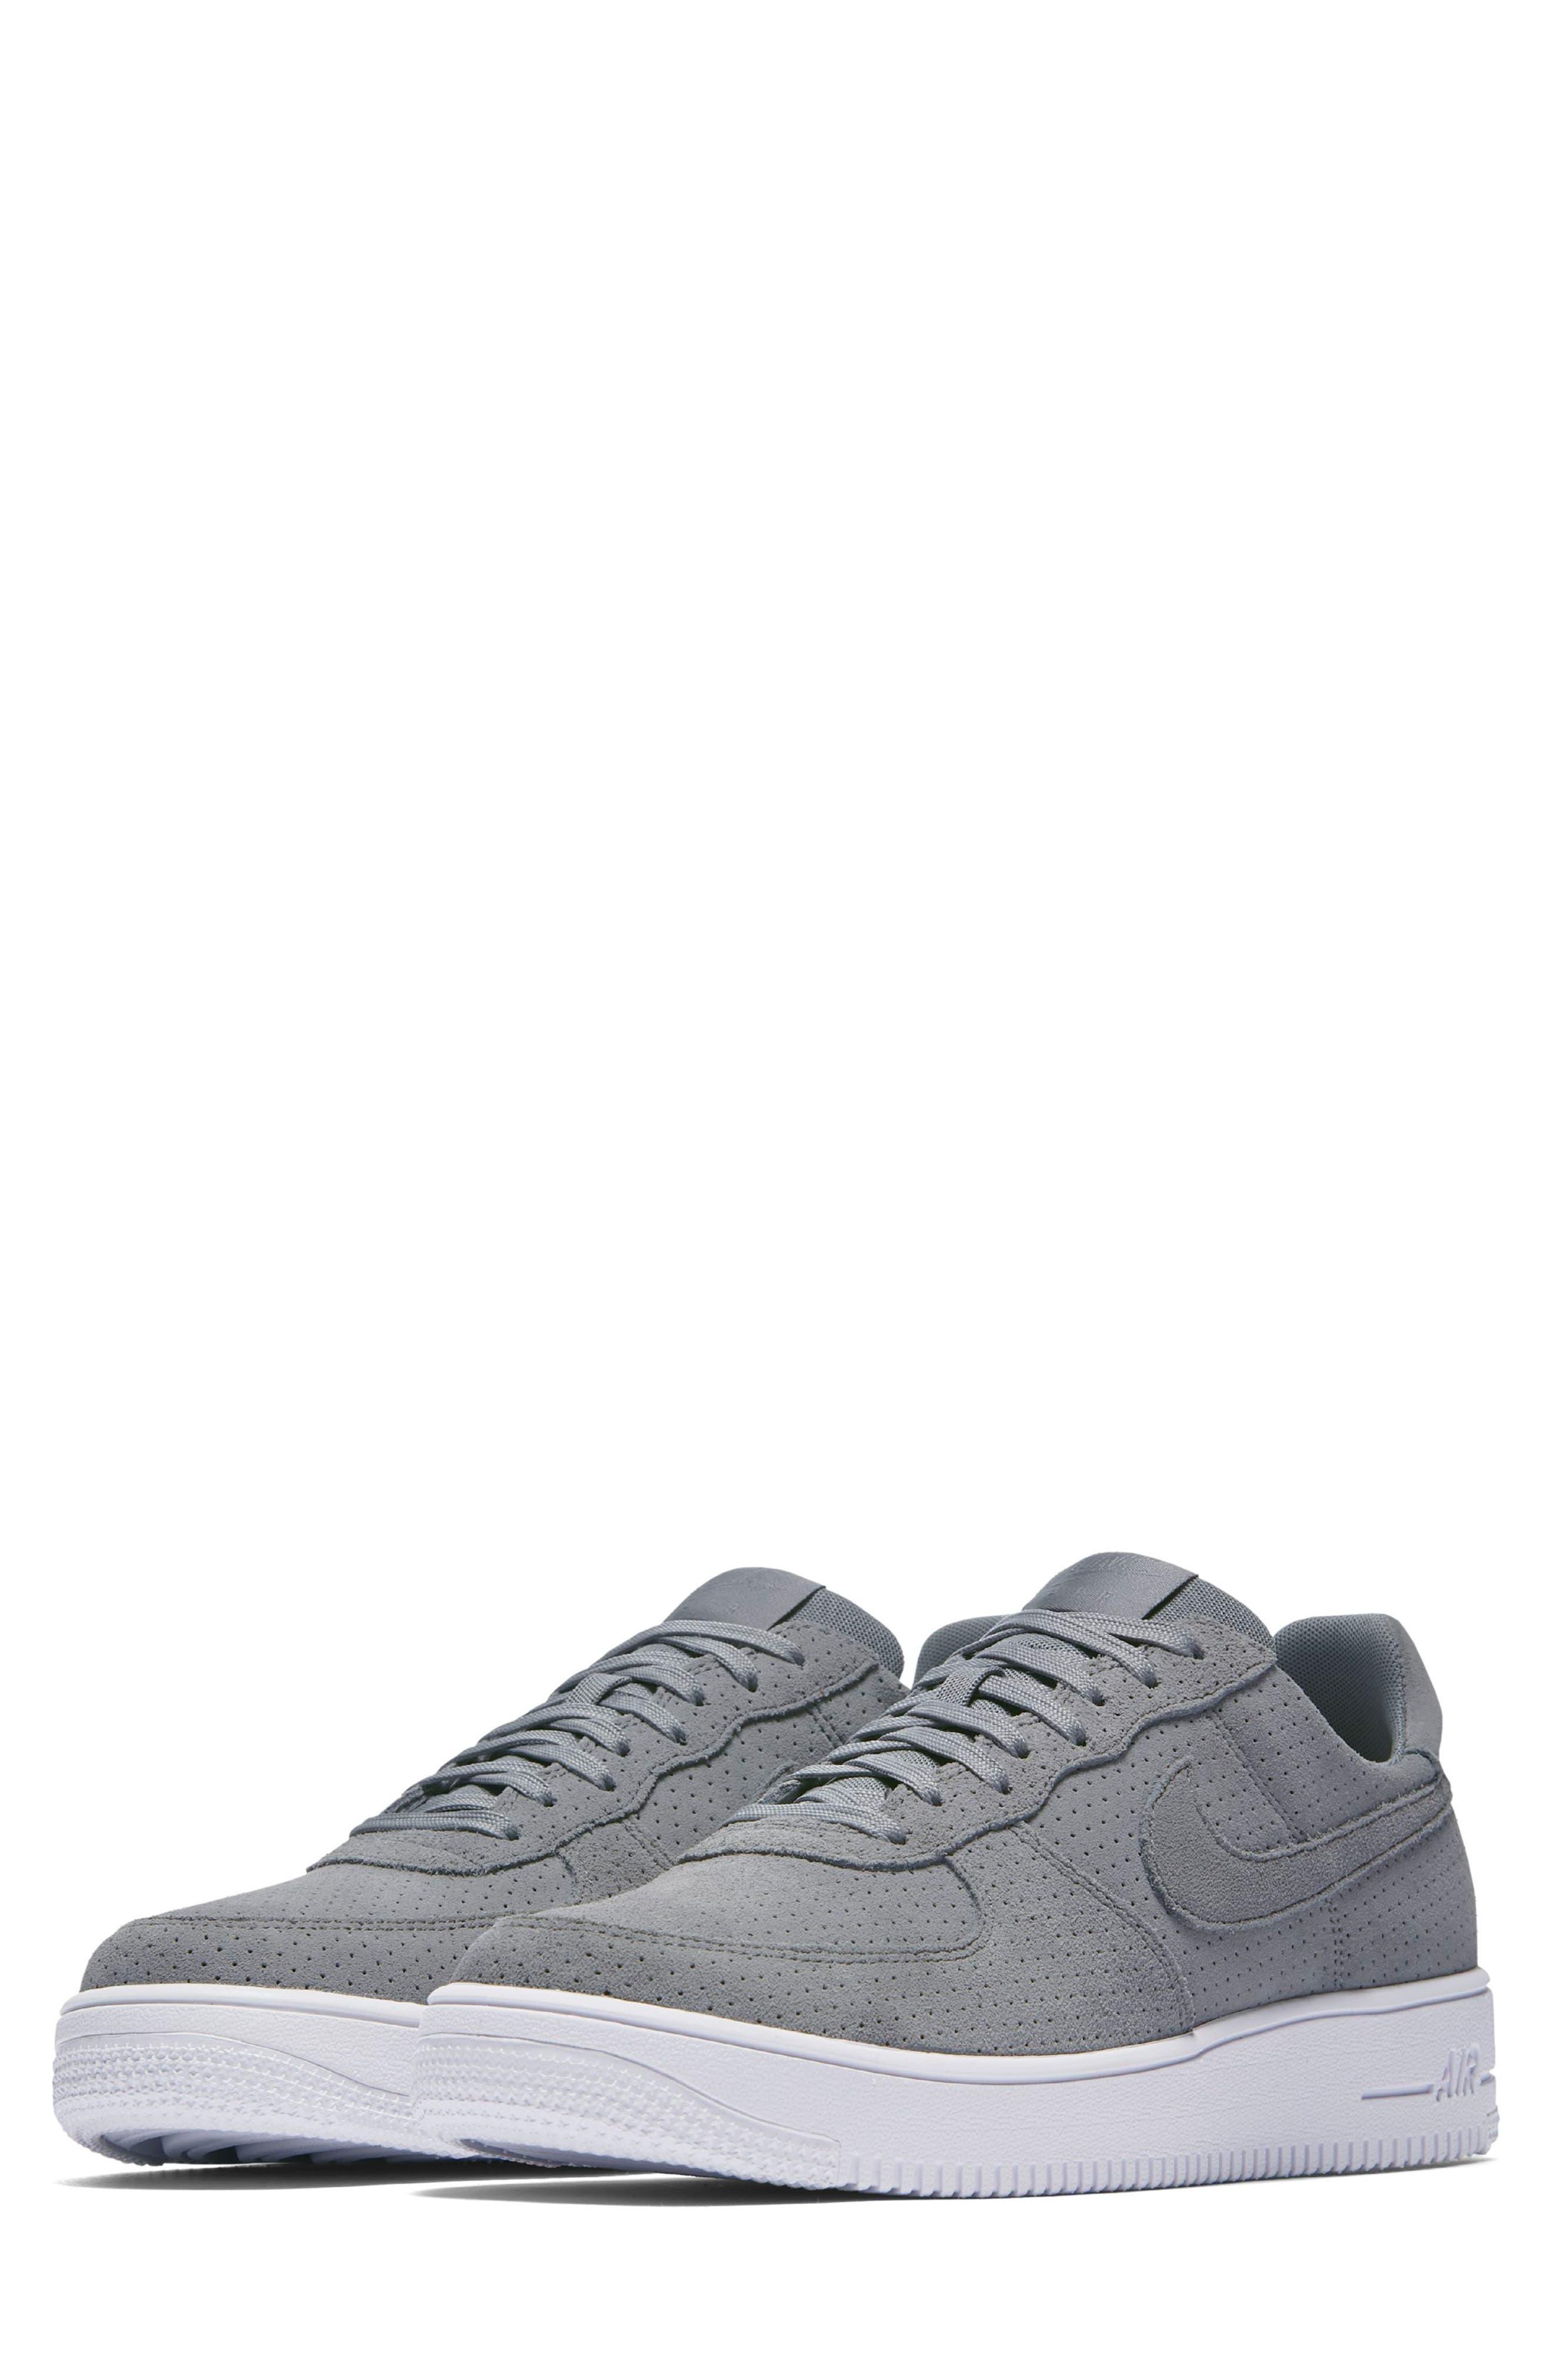 Air Force 1 Ultraforce Sneaker,                             Main thumbnail 1, color,                             029